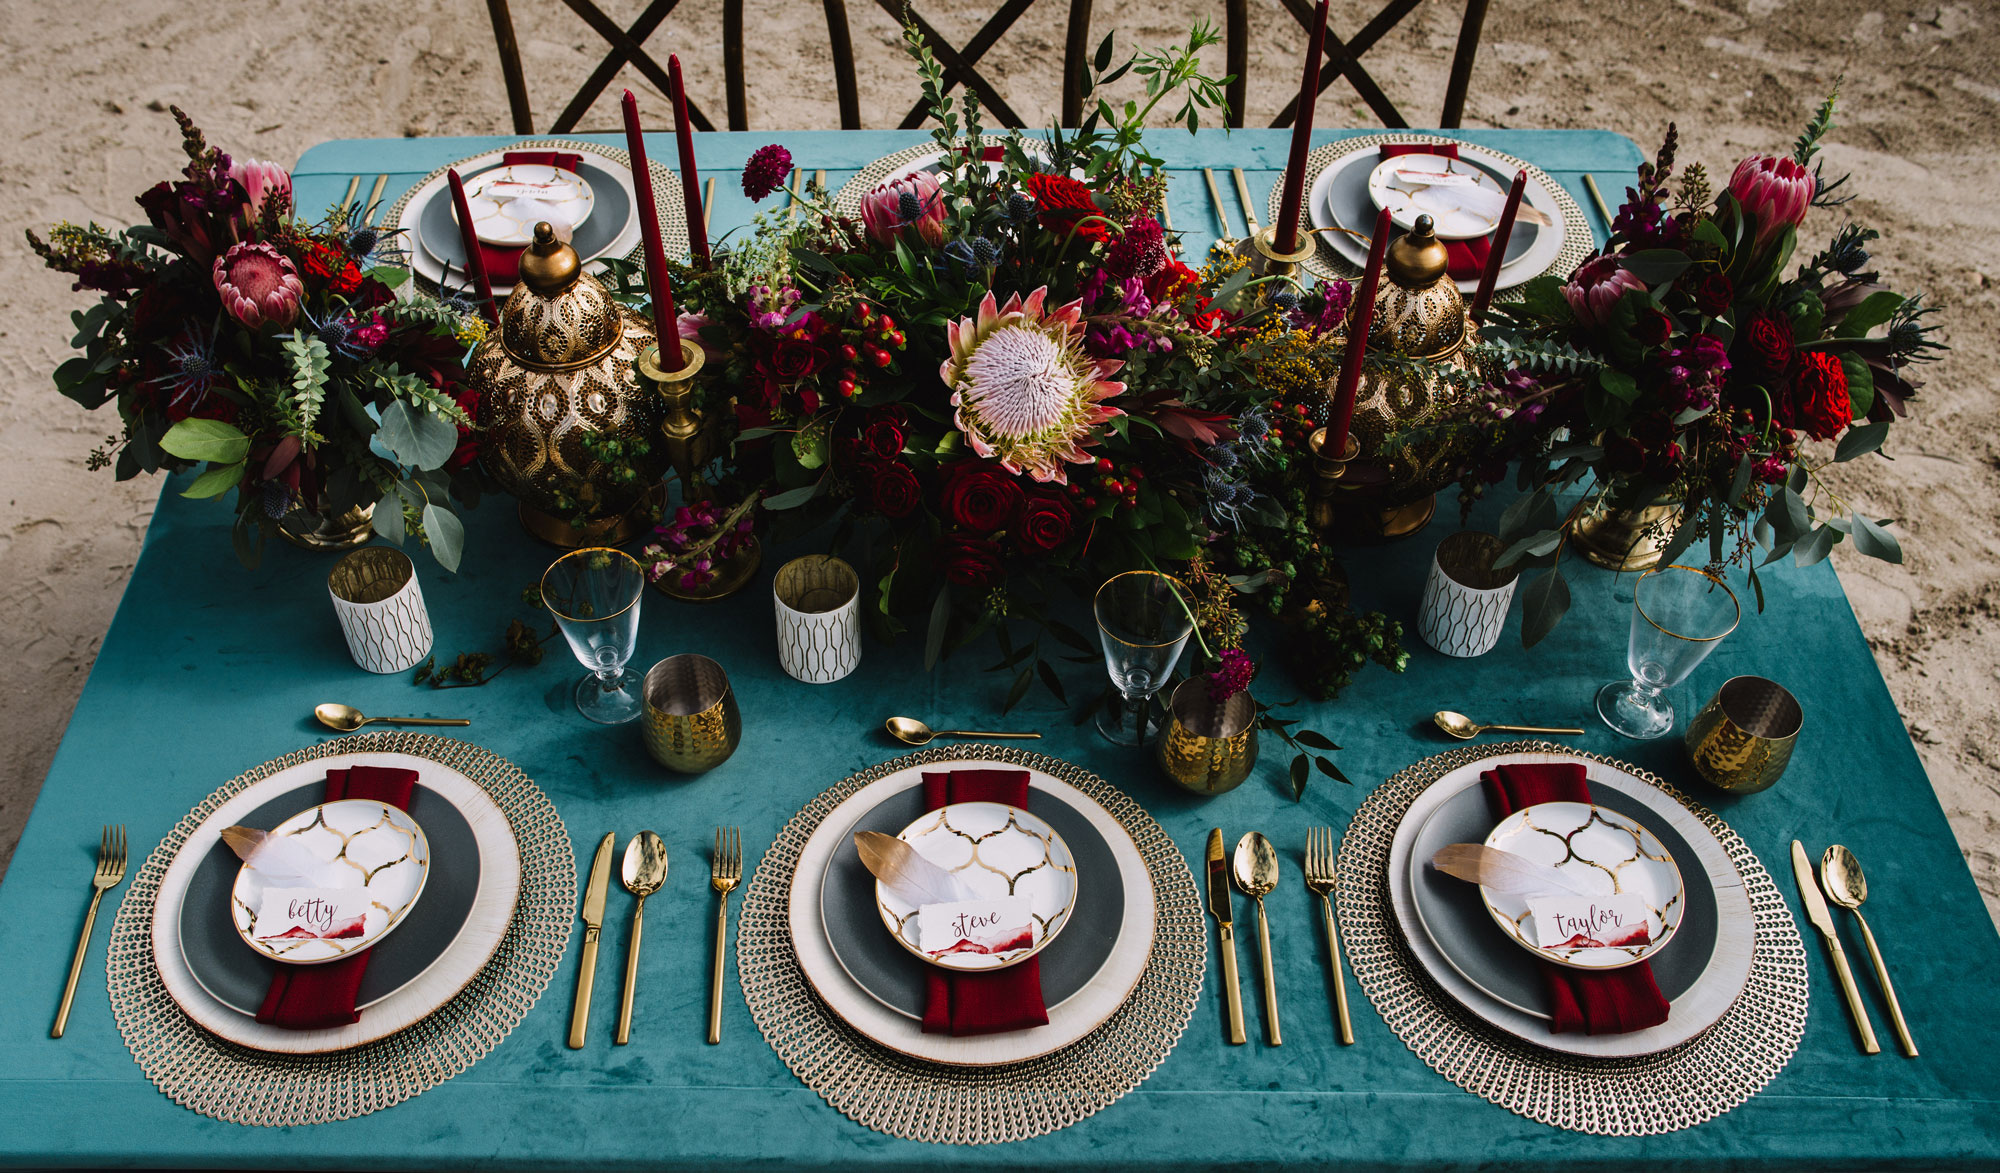 bpp_sundial-resort-wedding-beach-wedding-florida-destination-wedding-cocolunaevents-25_web